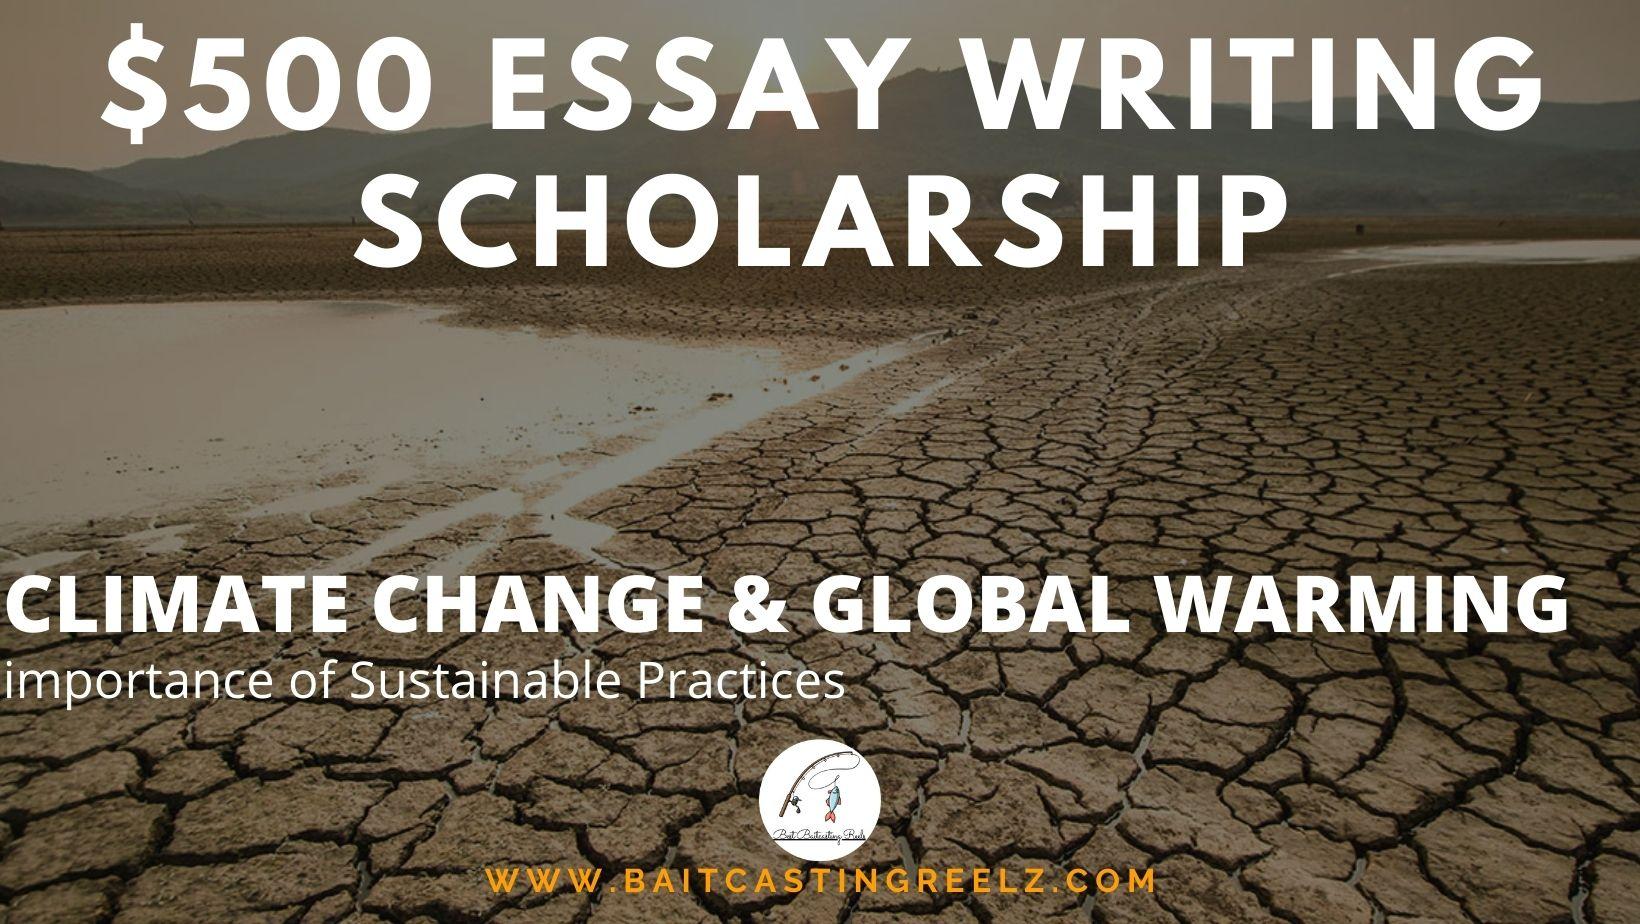 essay writing scholarship